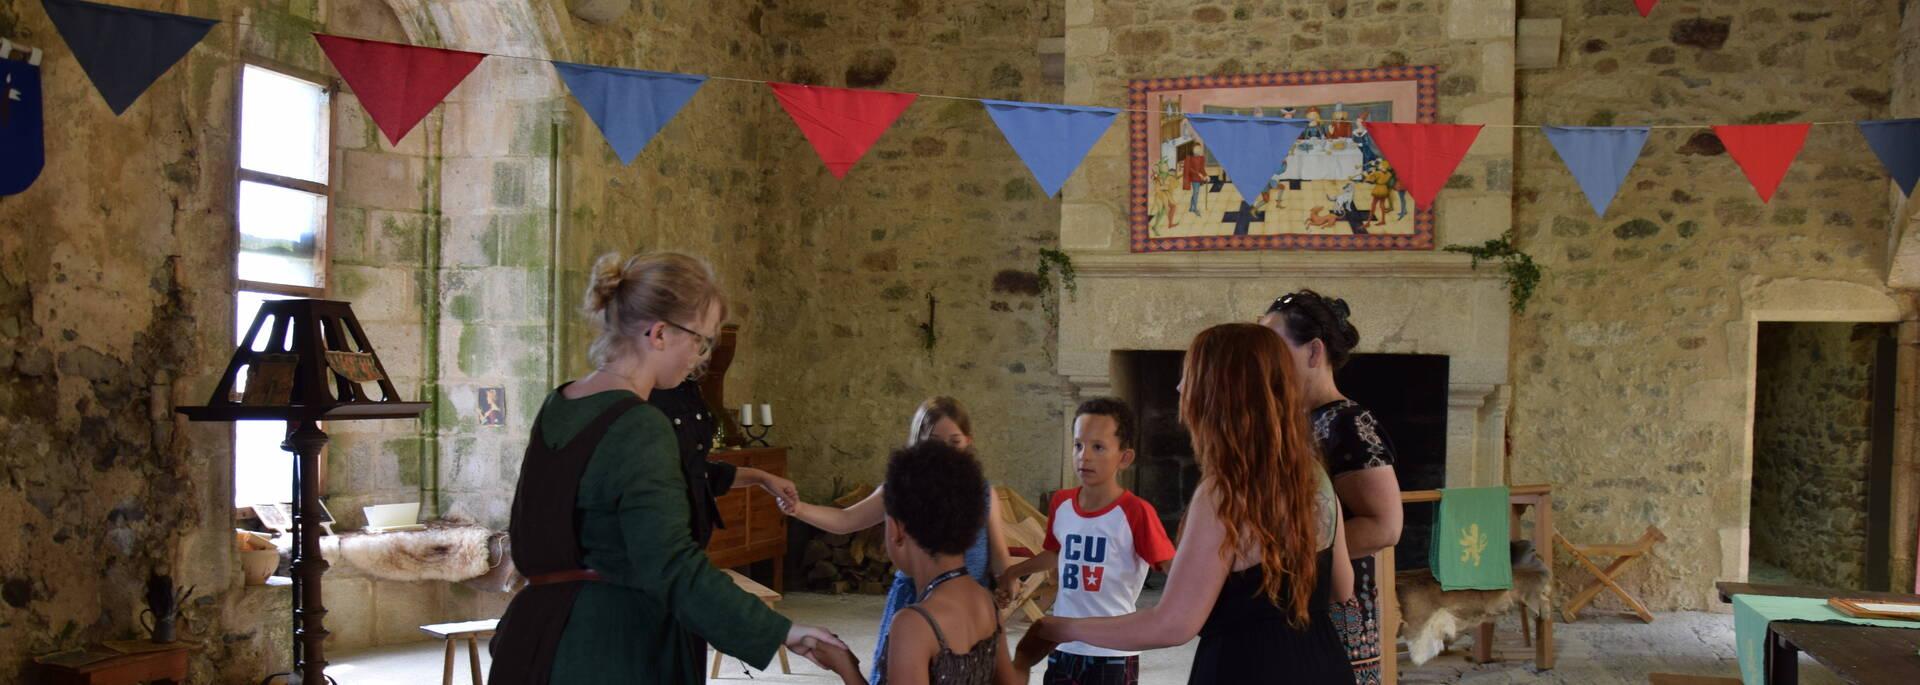 Château Saint Mesmin – danse médiévale @OTBB